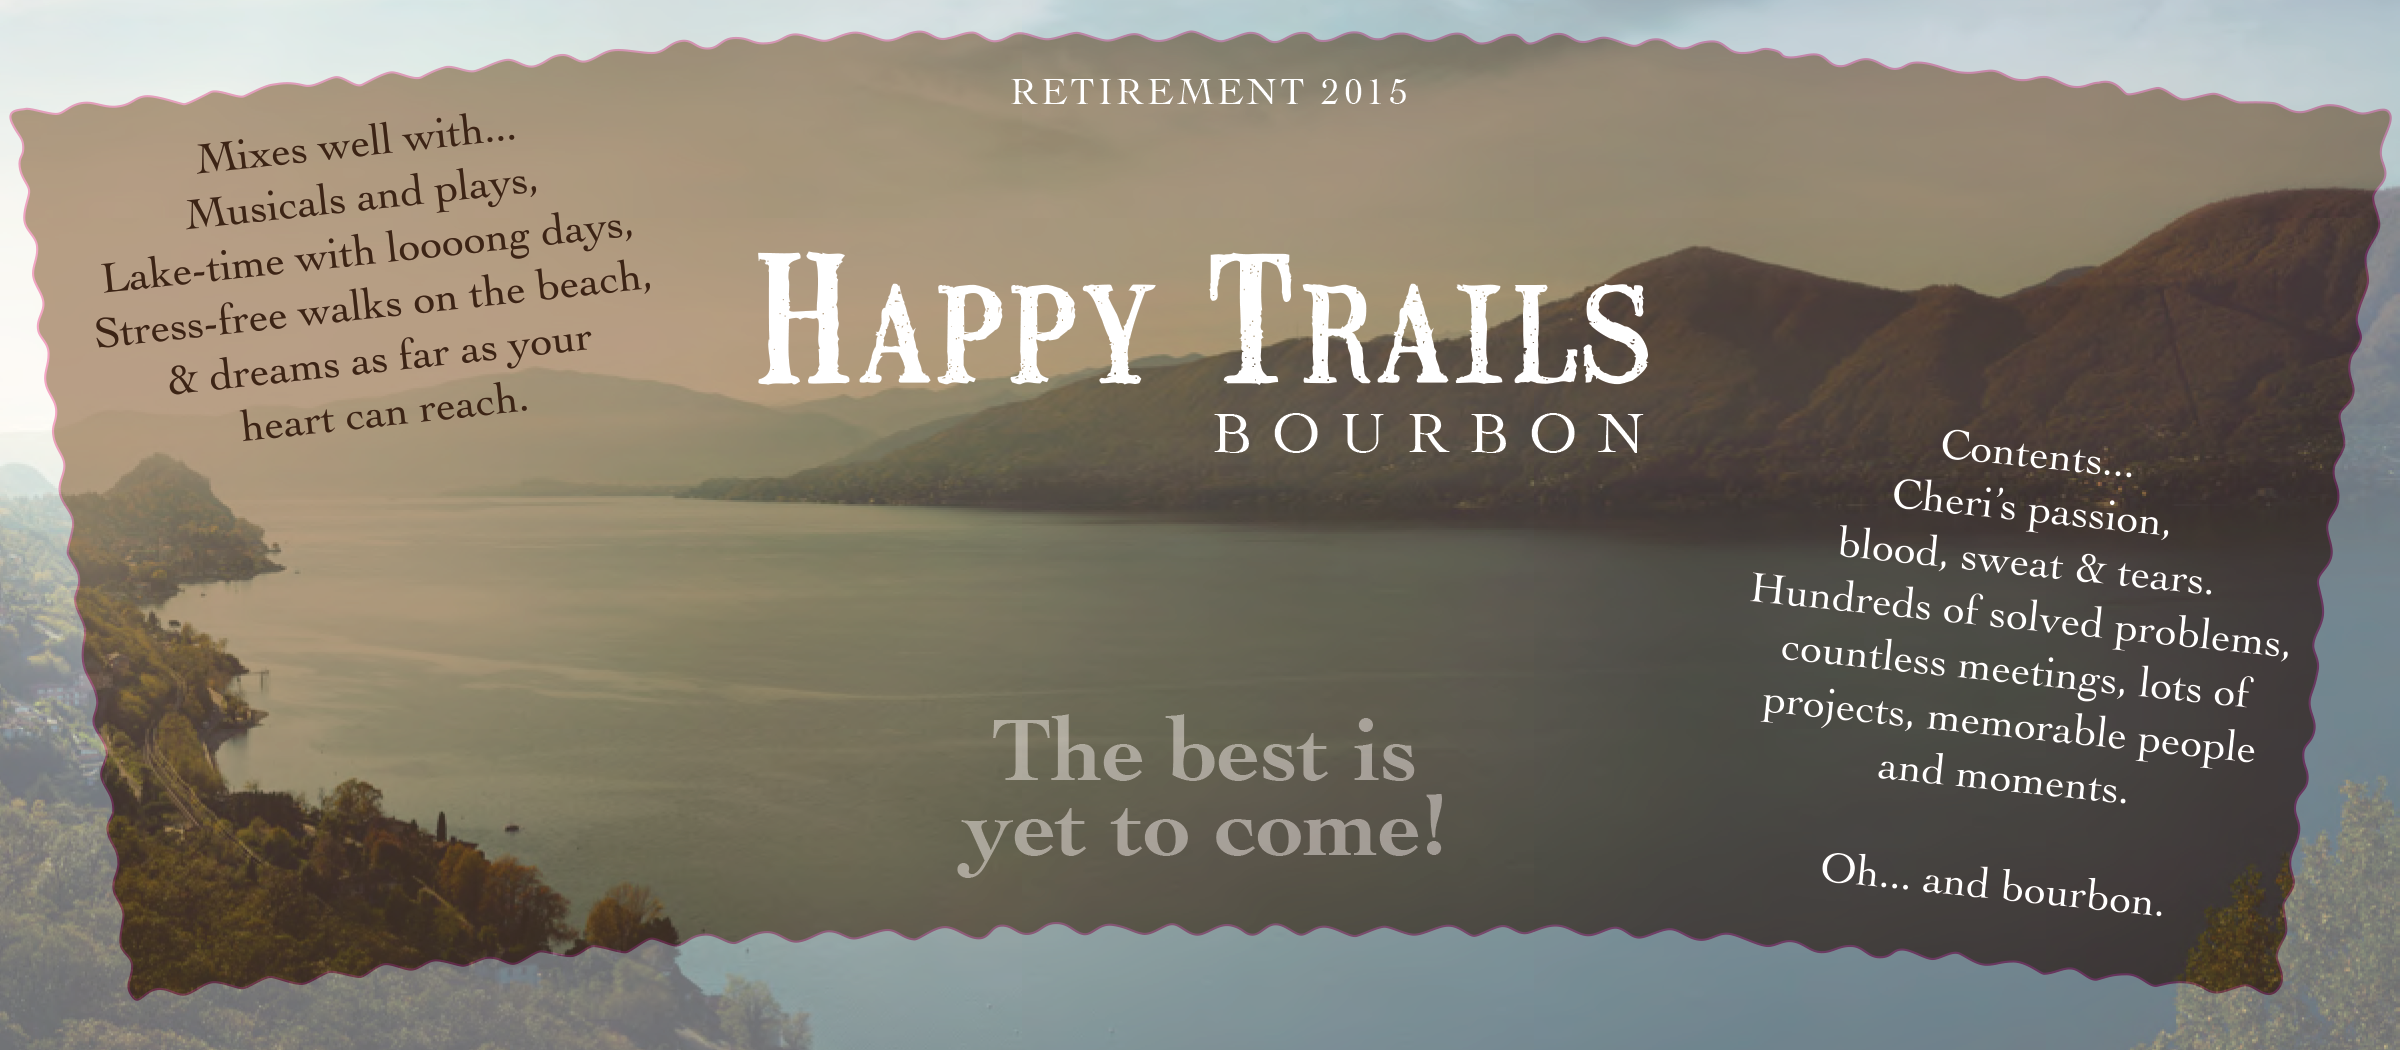 Lake clipart happy trail. Graphic design trails retirement